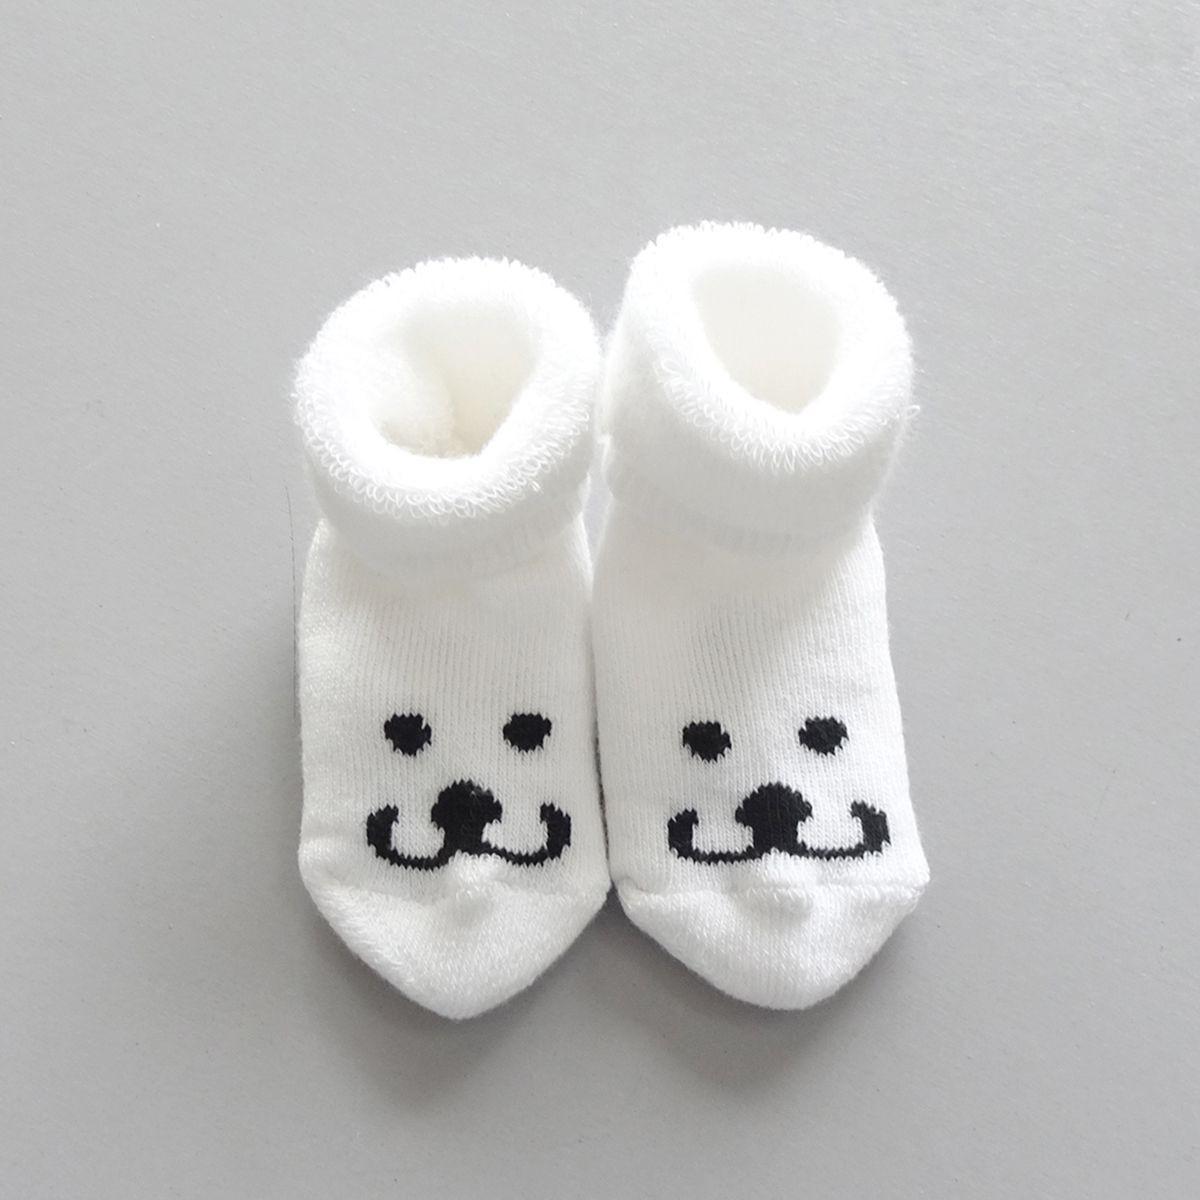 Newborn Socks Smile   White